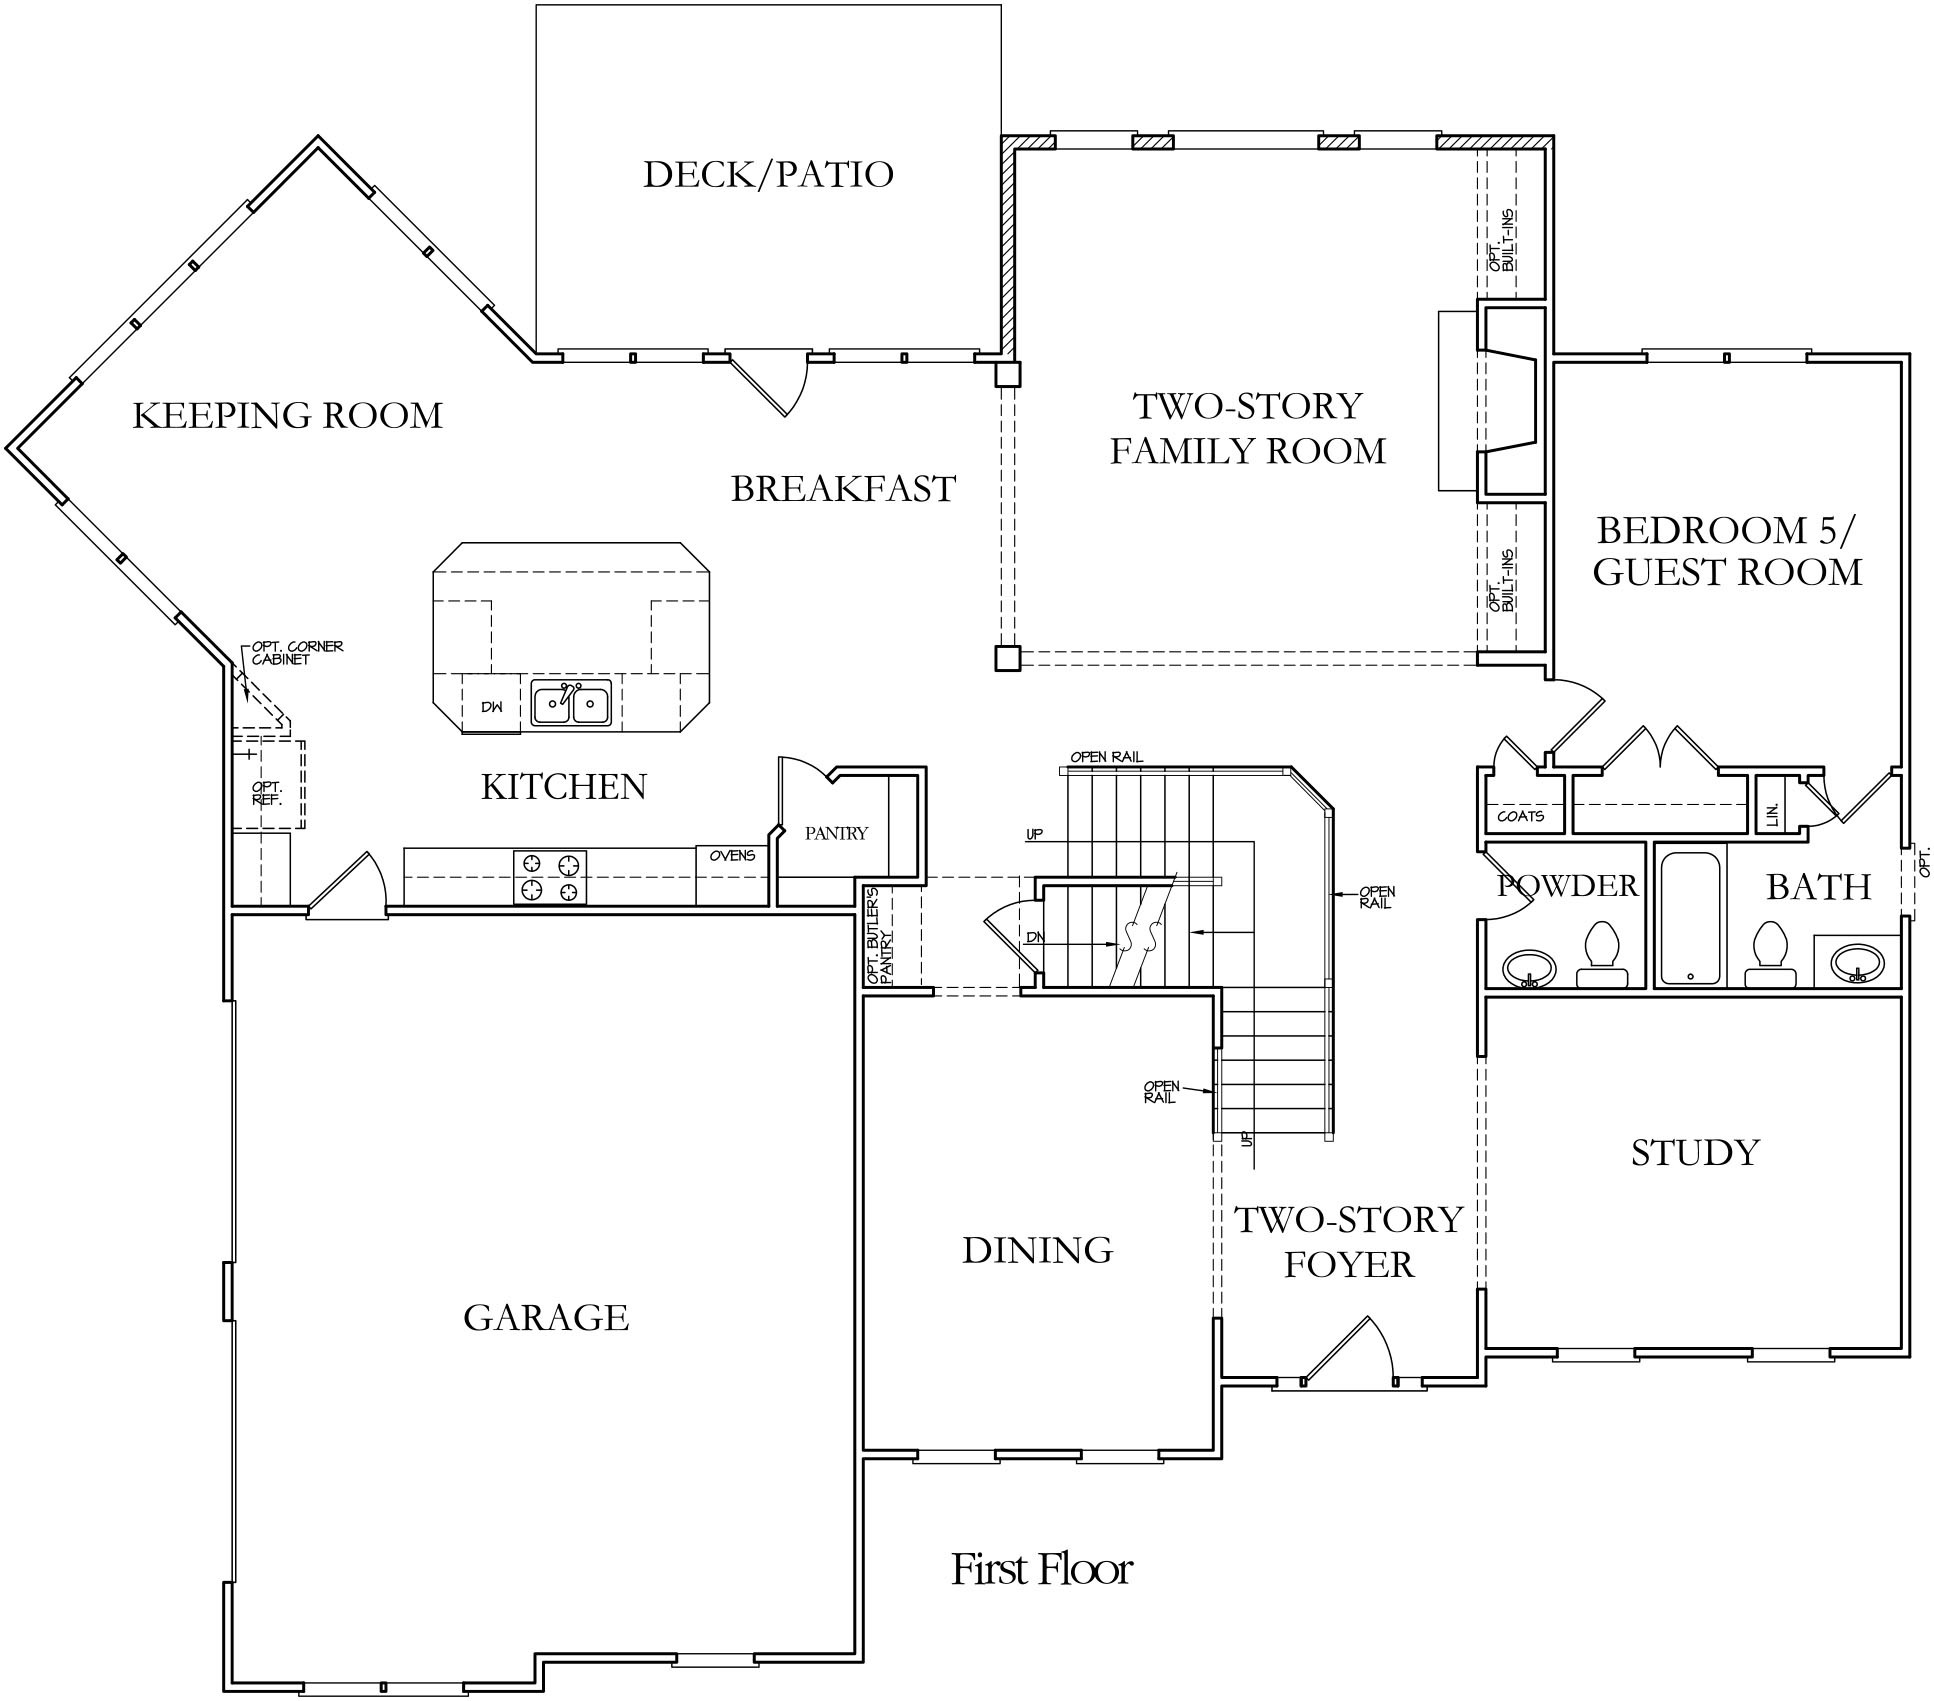 BREVARD-flr-plan-120180321093352